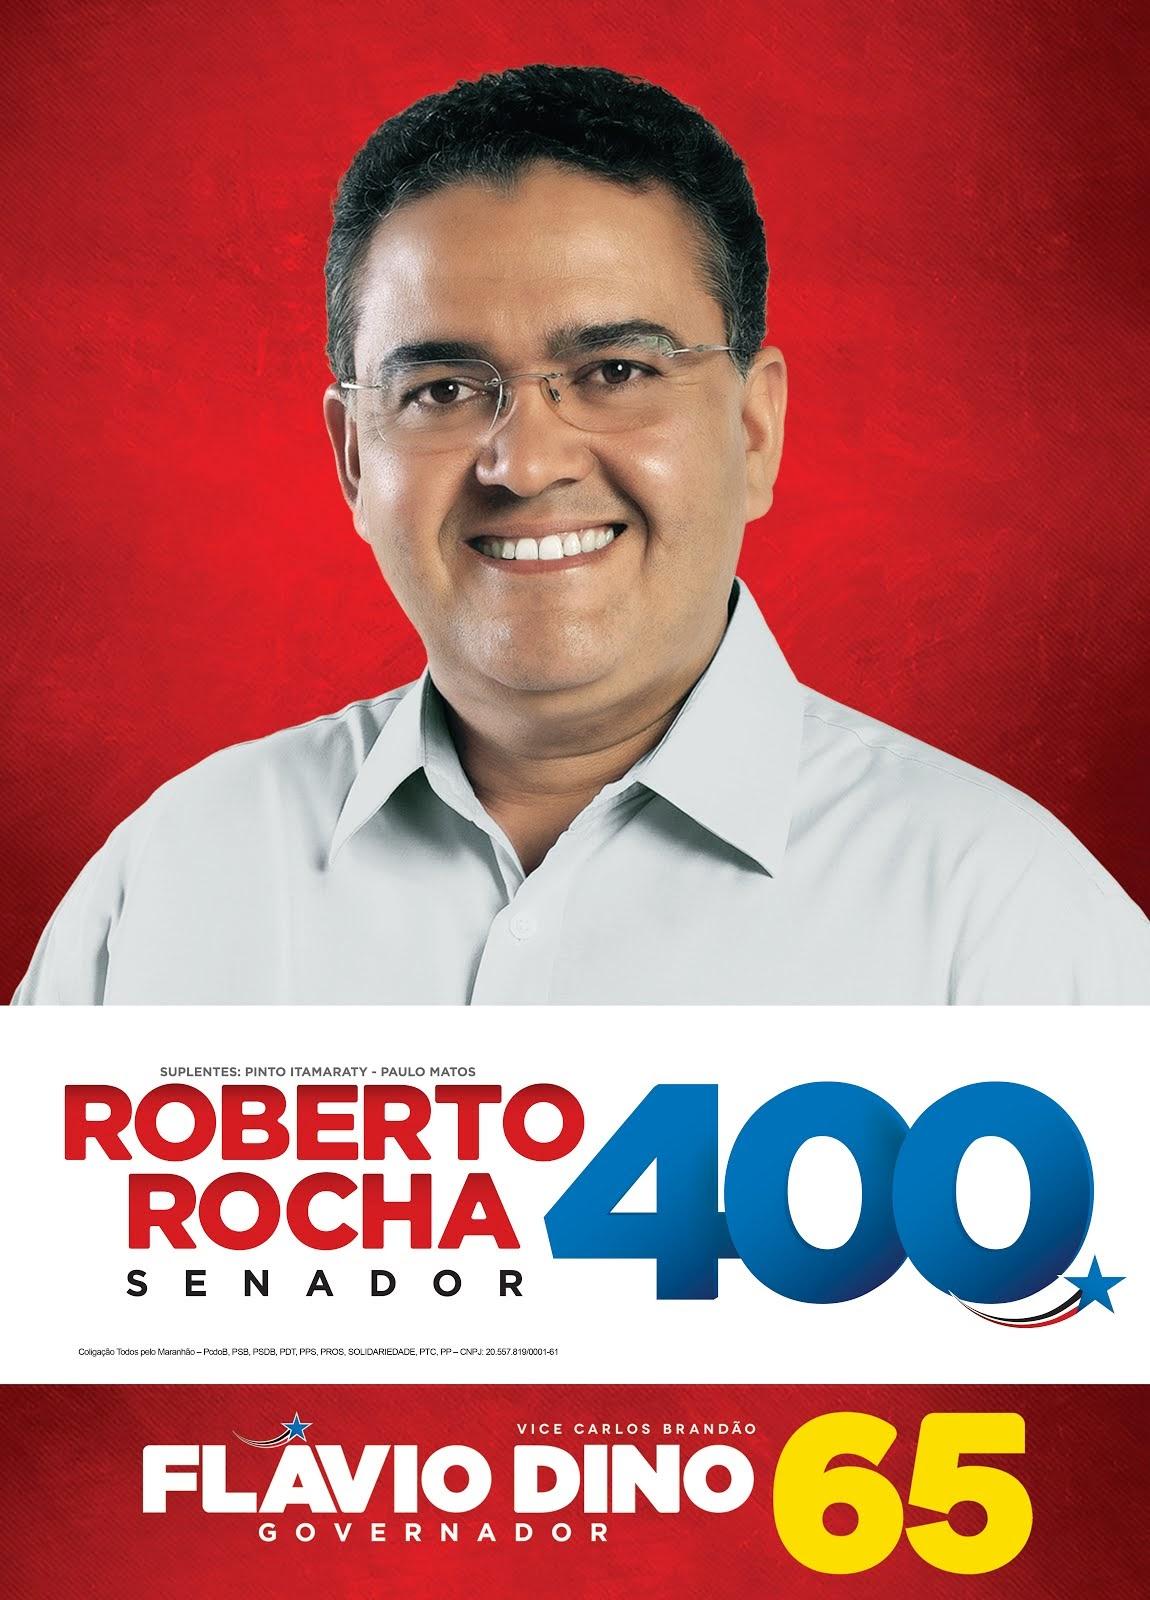 ROBERTO ROCHA 400